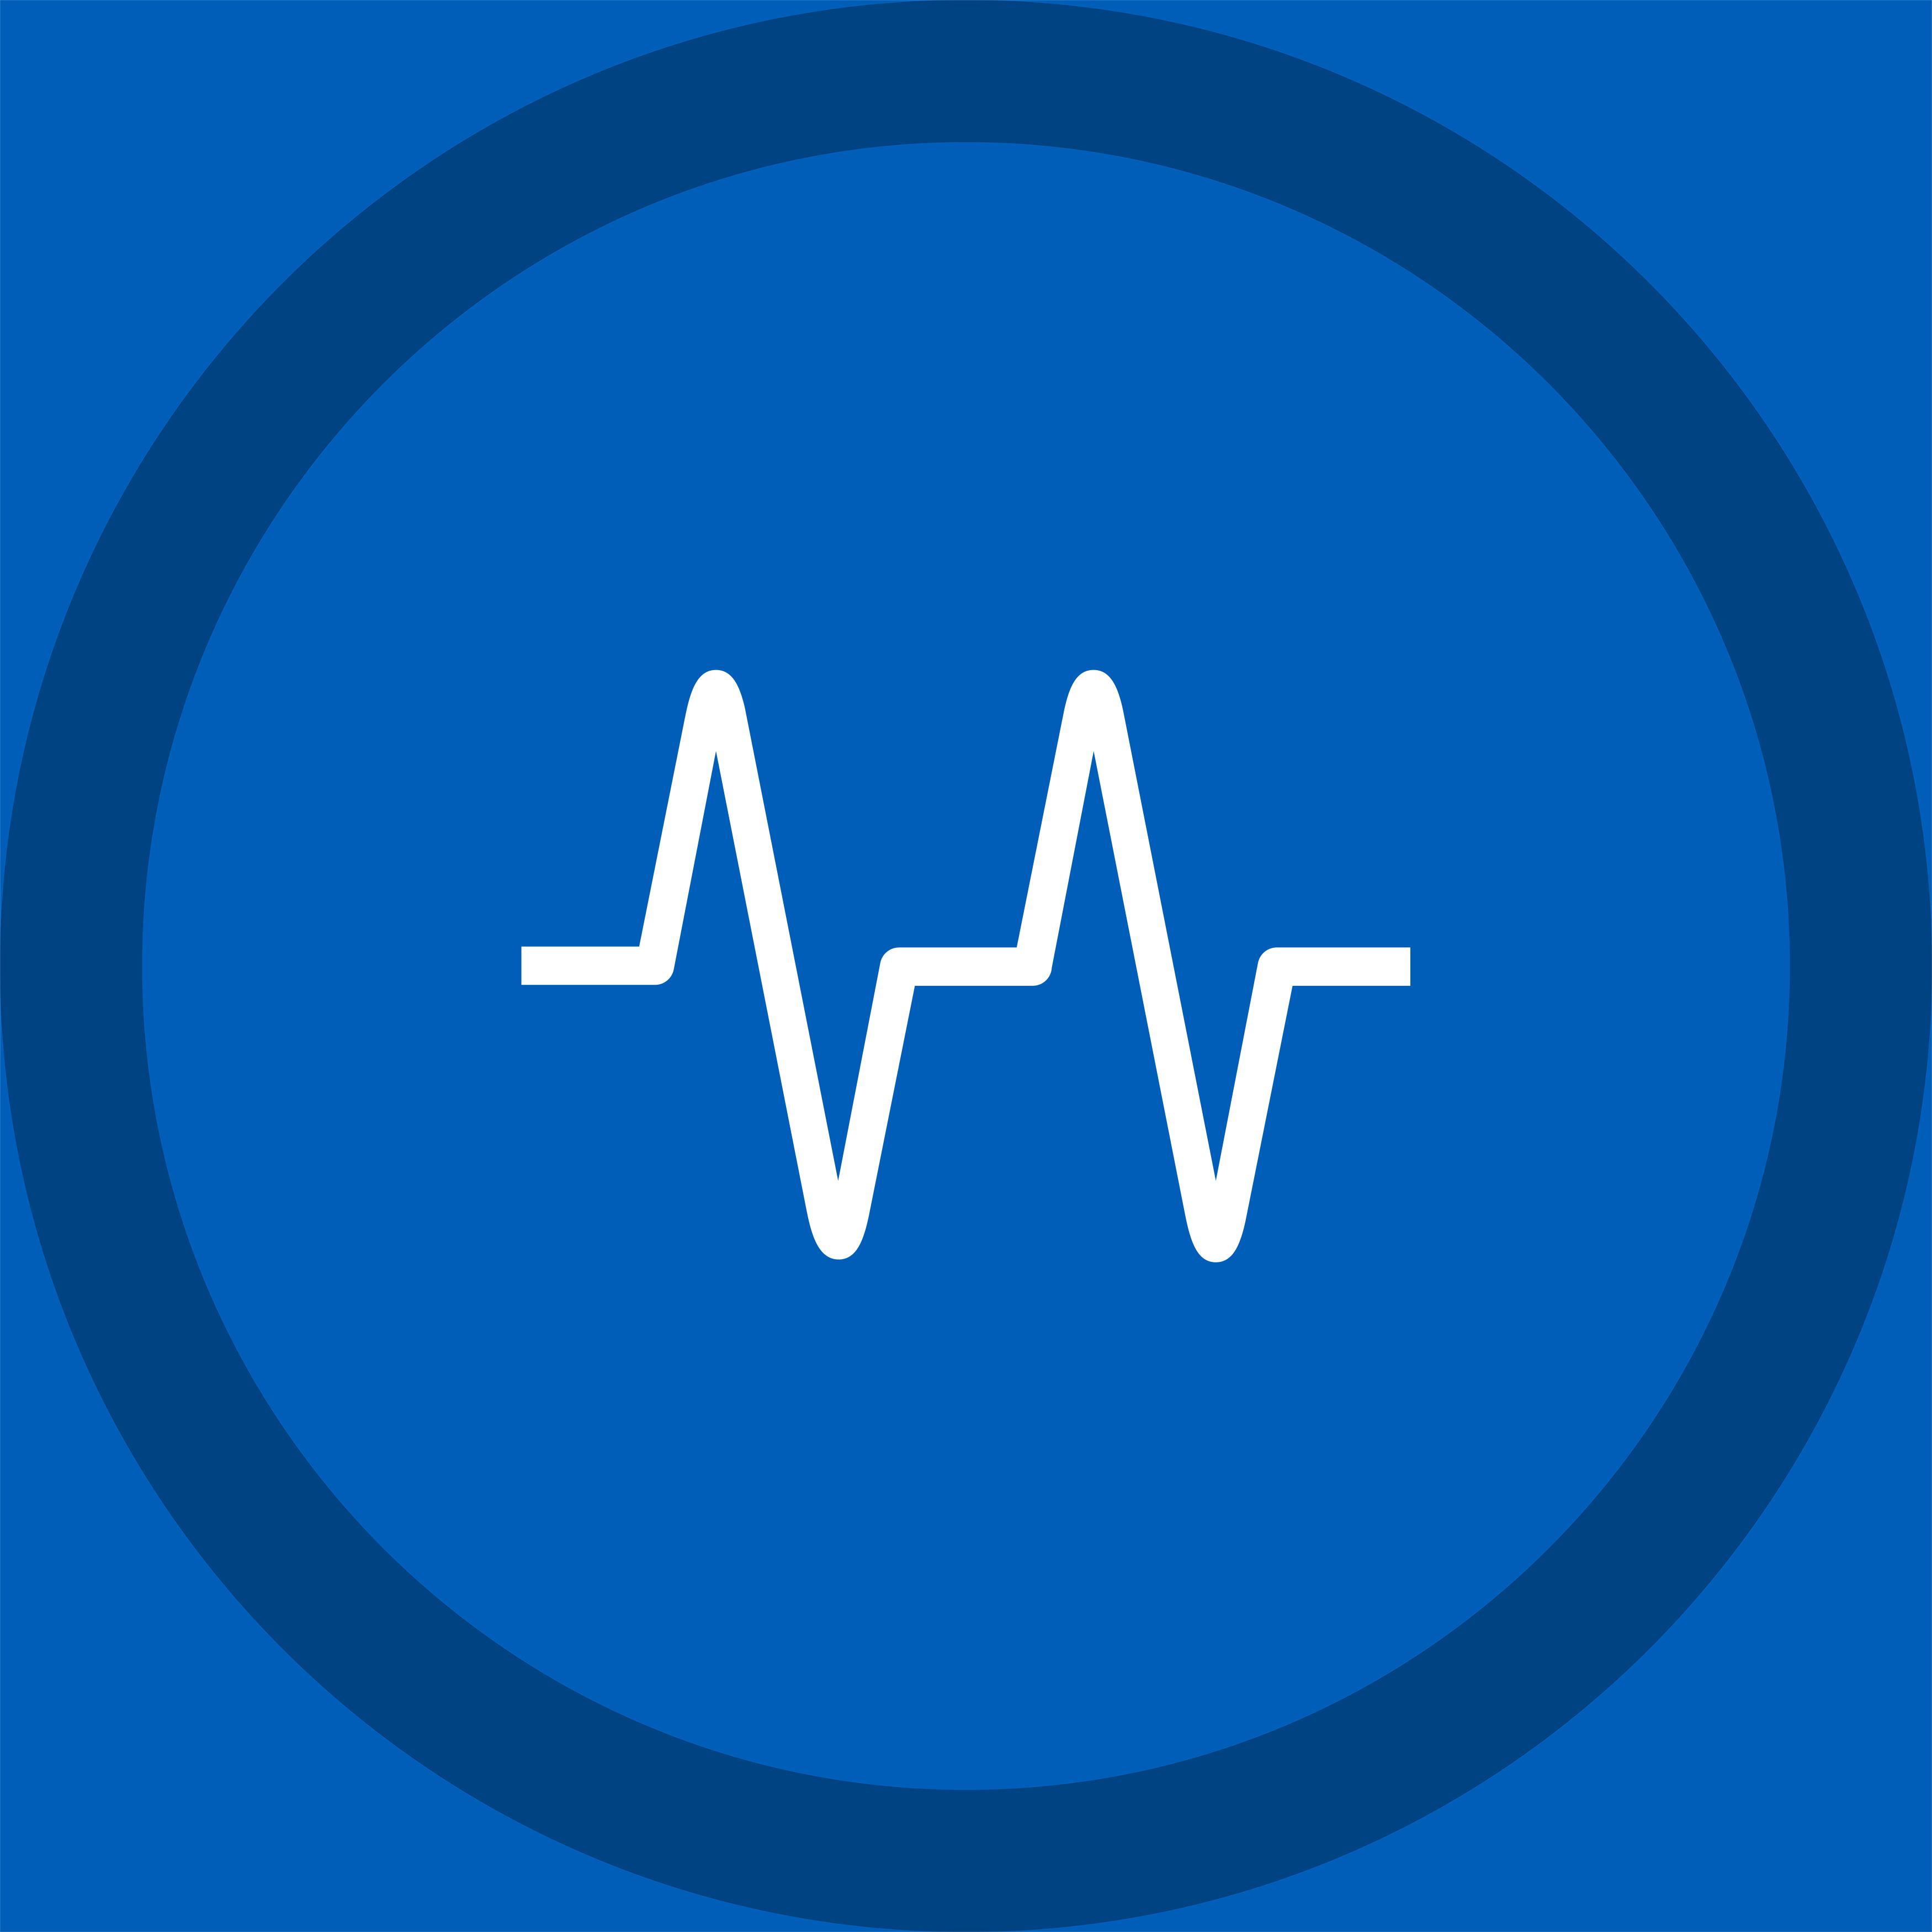 Electrocardiogrammes